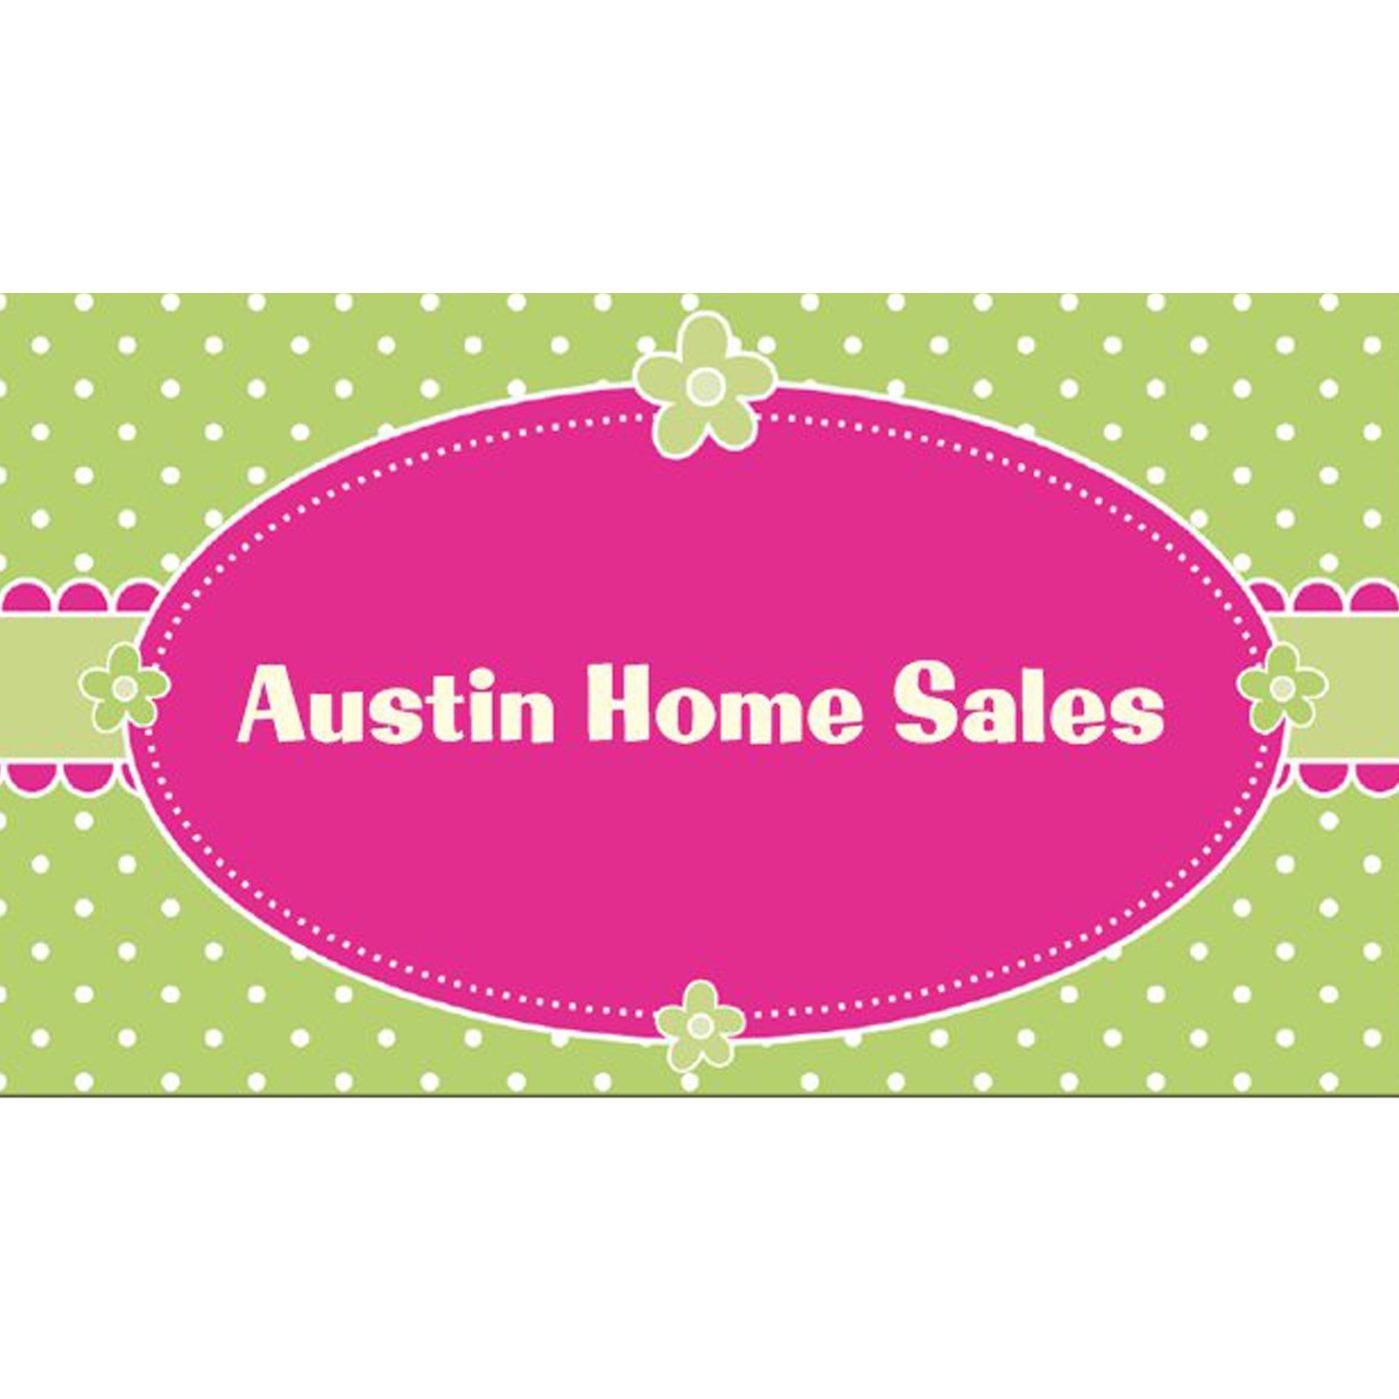 Betsy Richter | Austin Home Sales